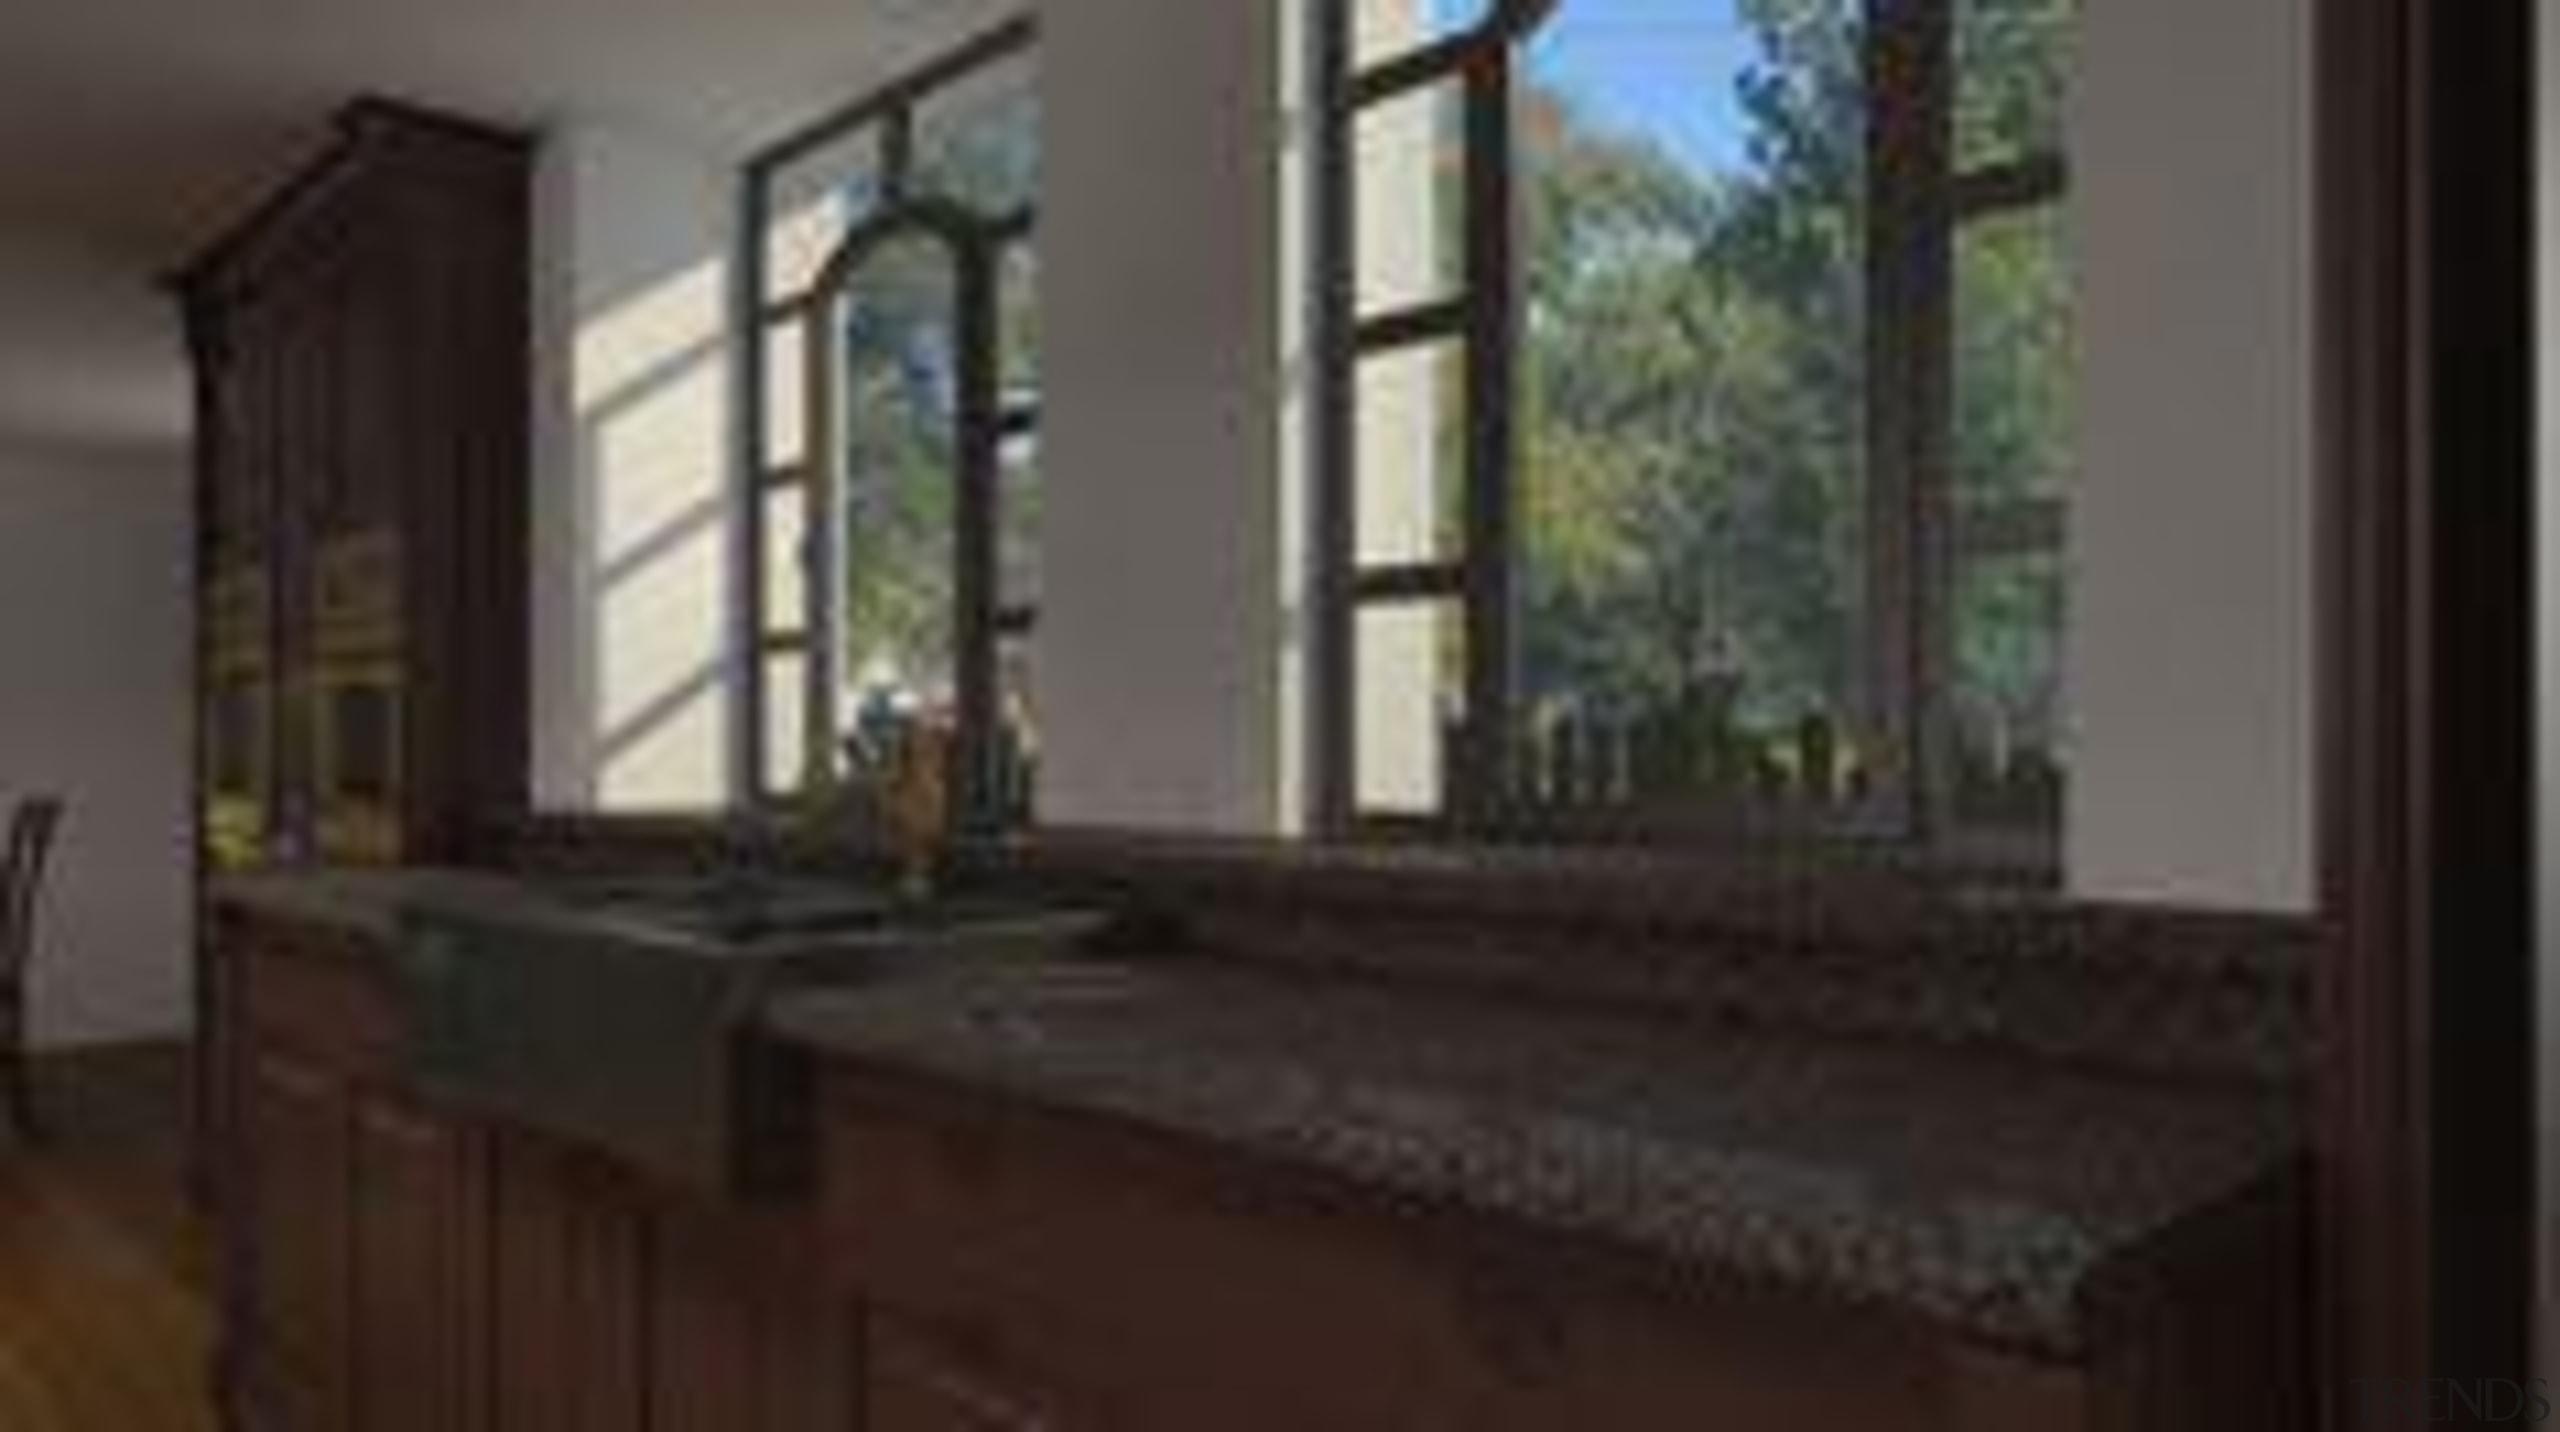 47d035291903bc15b72368464e1e6269.jpg - 47d035291903bc15b72368464e1e6269.jpg - glass | home | glass, home, interior design, property, real estate, room, window, black, gray